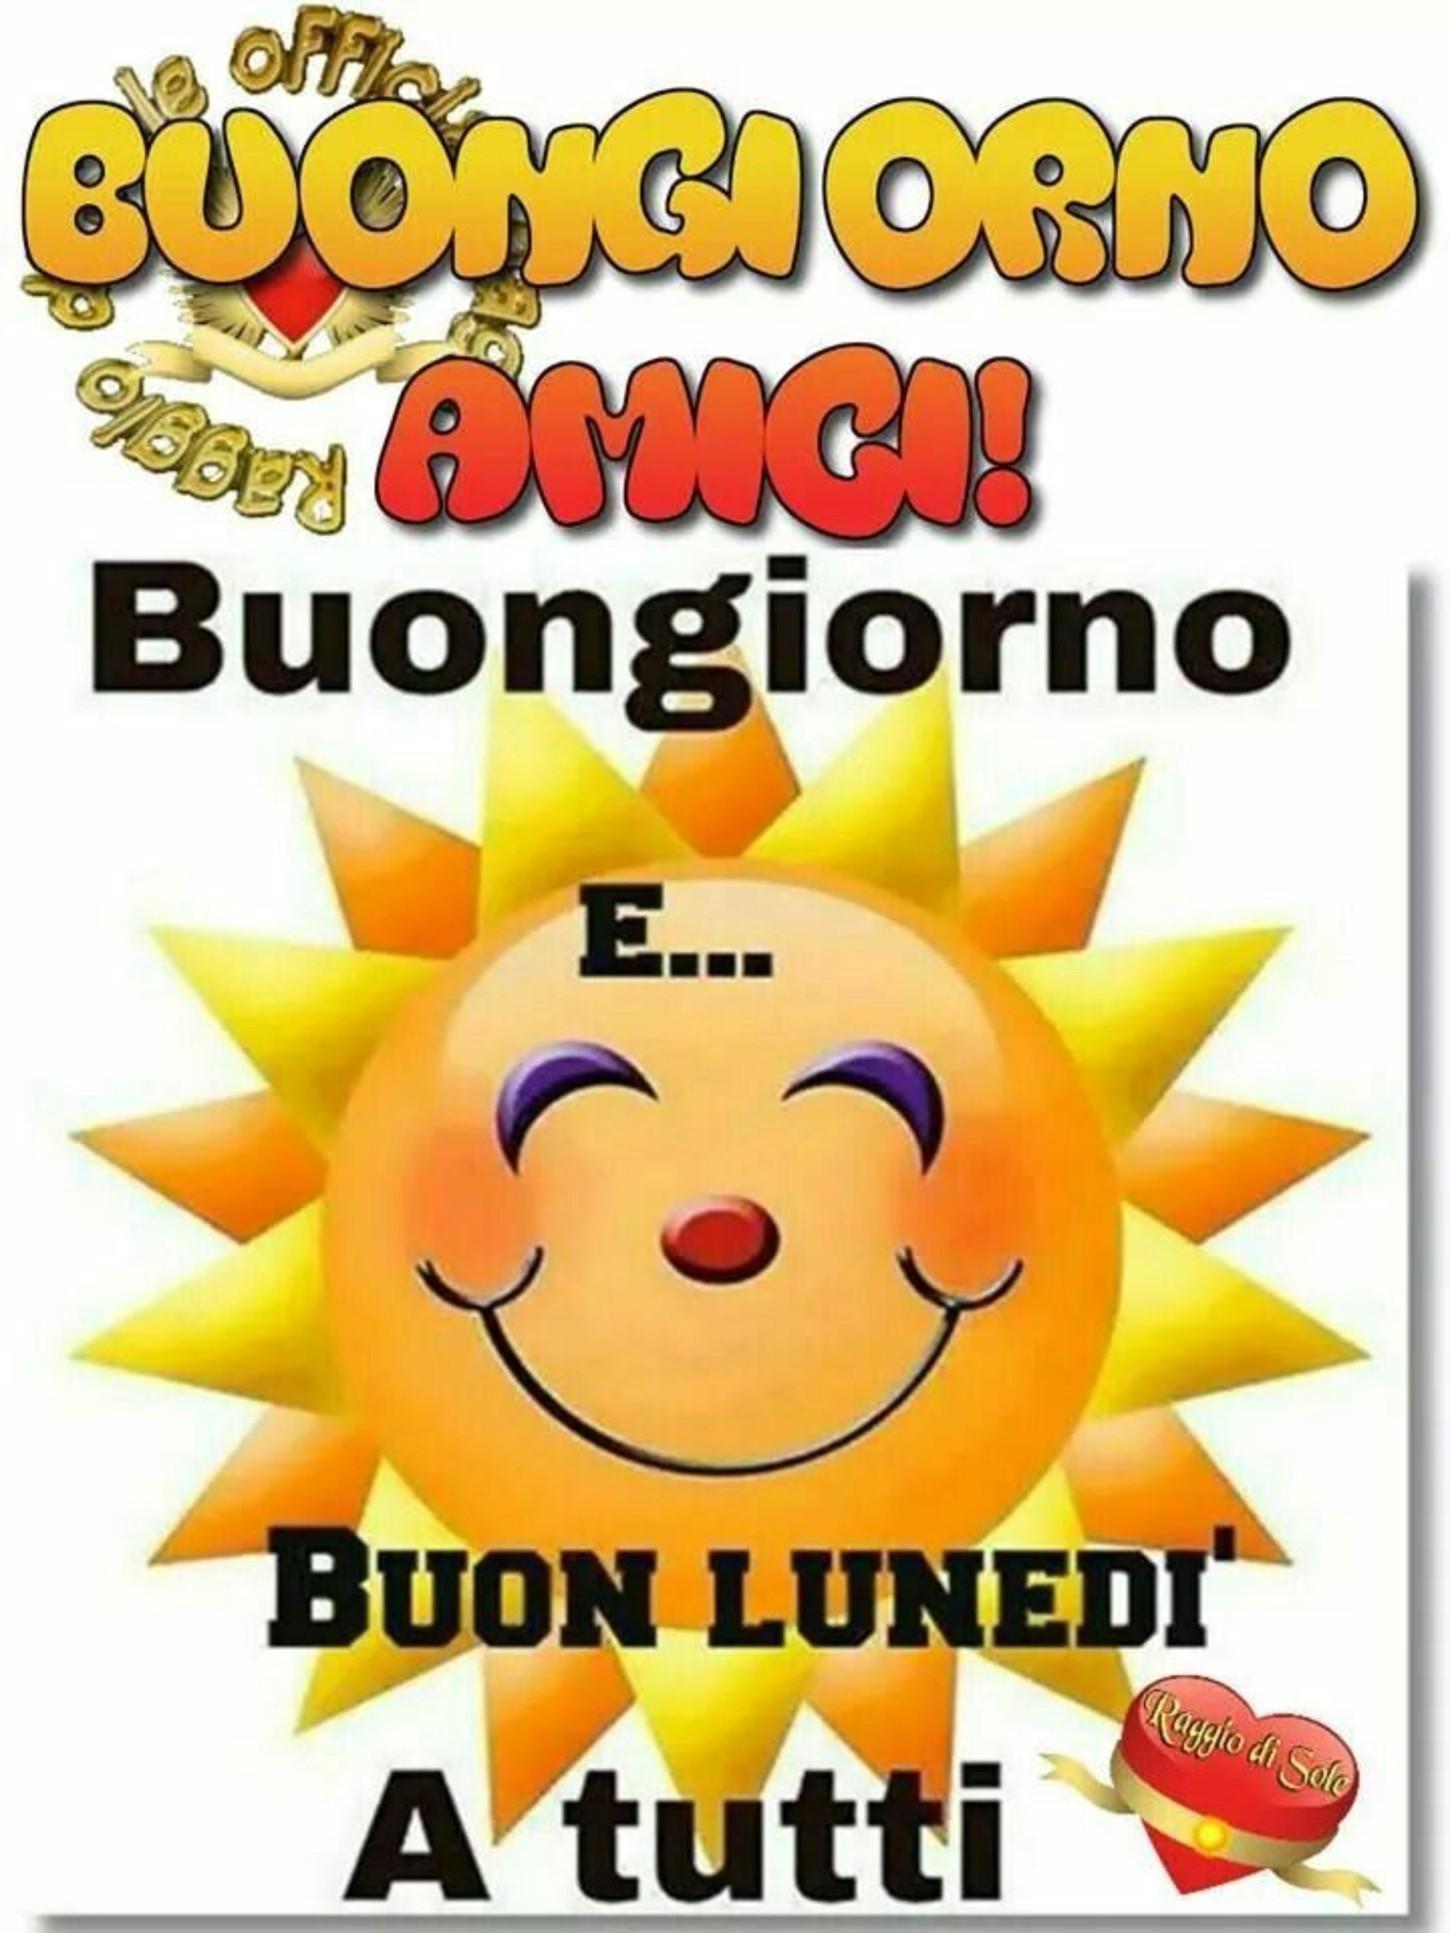 Sereno Lunedi Frasi 6355 Immaginifacebook It